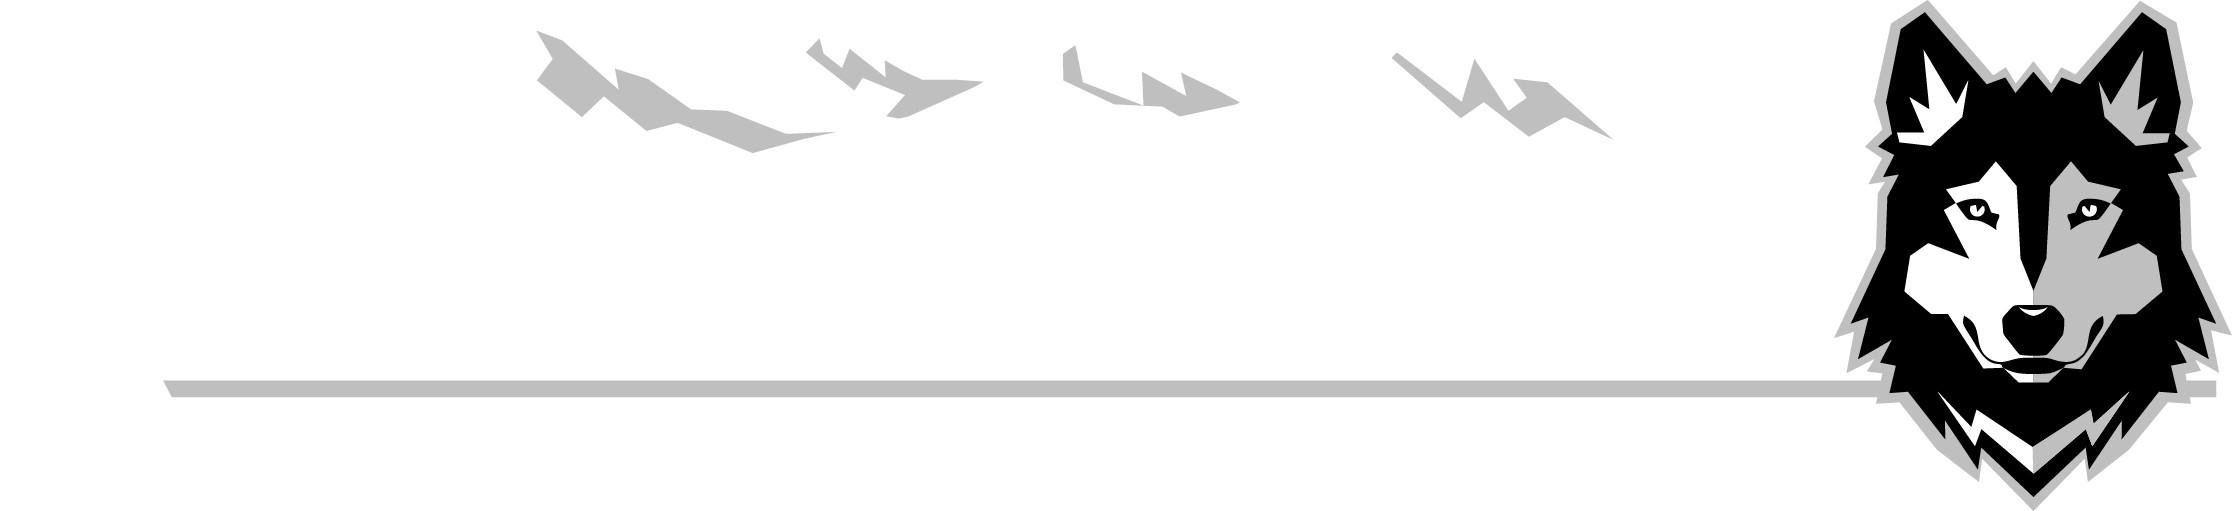 Design a logo for a RV facebook group wolfpack toyhauler owners